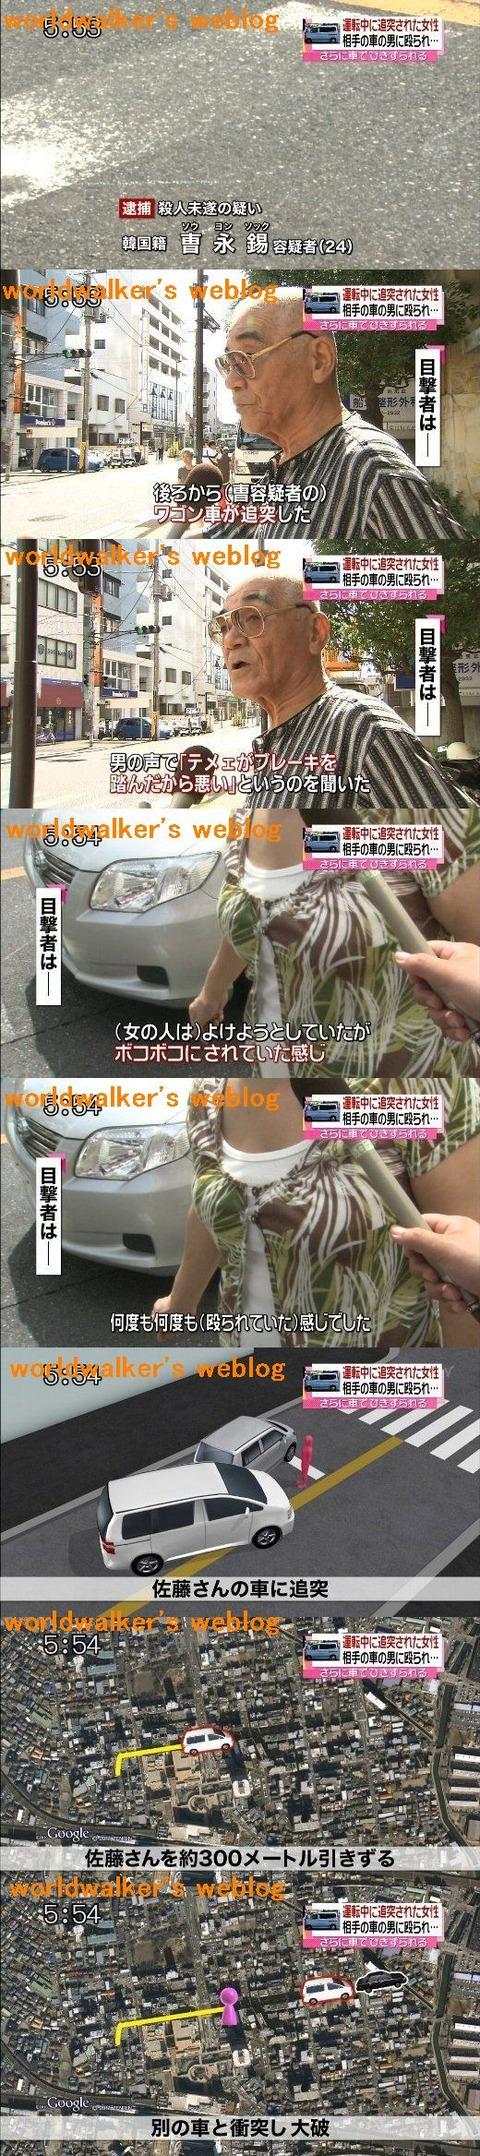 韓国人、曺永錫を逮捕16ww